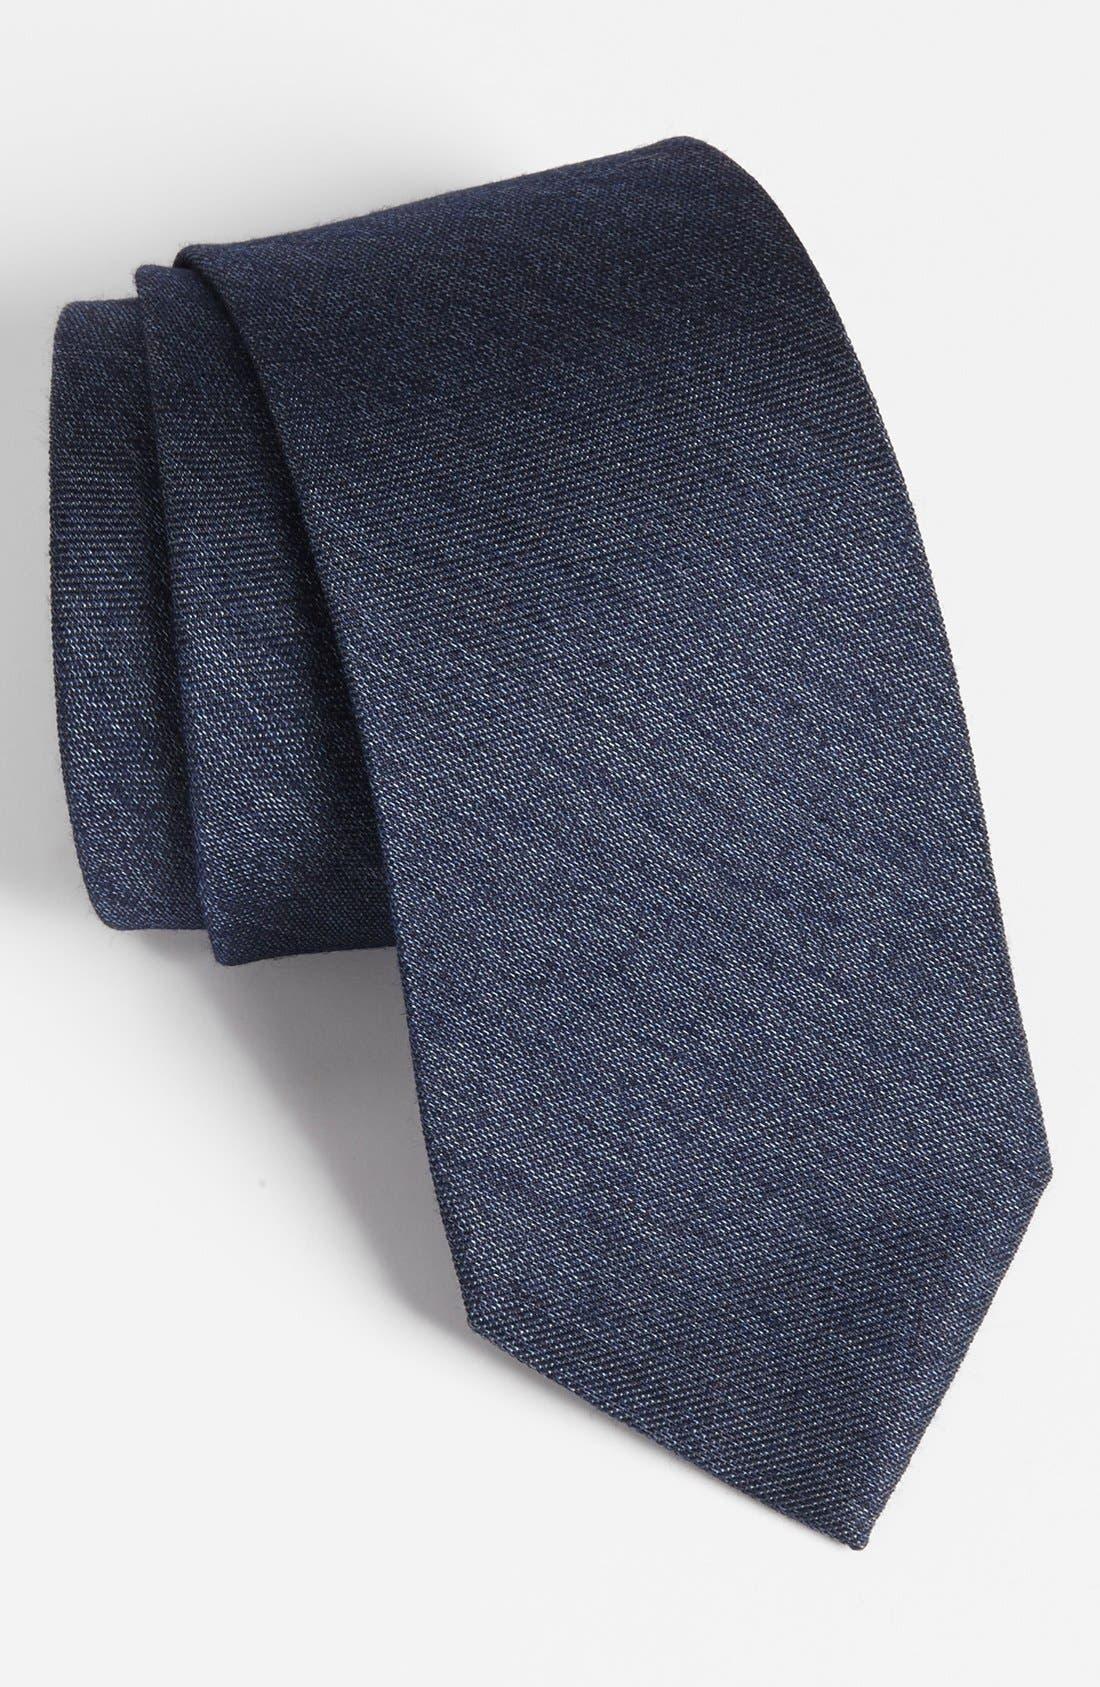 Main Image - Z Zegna Woven Silk & Wool Tie